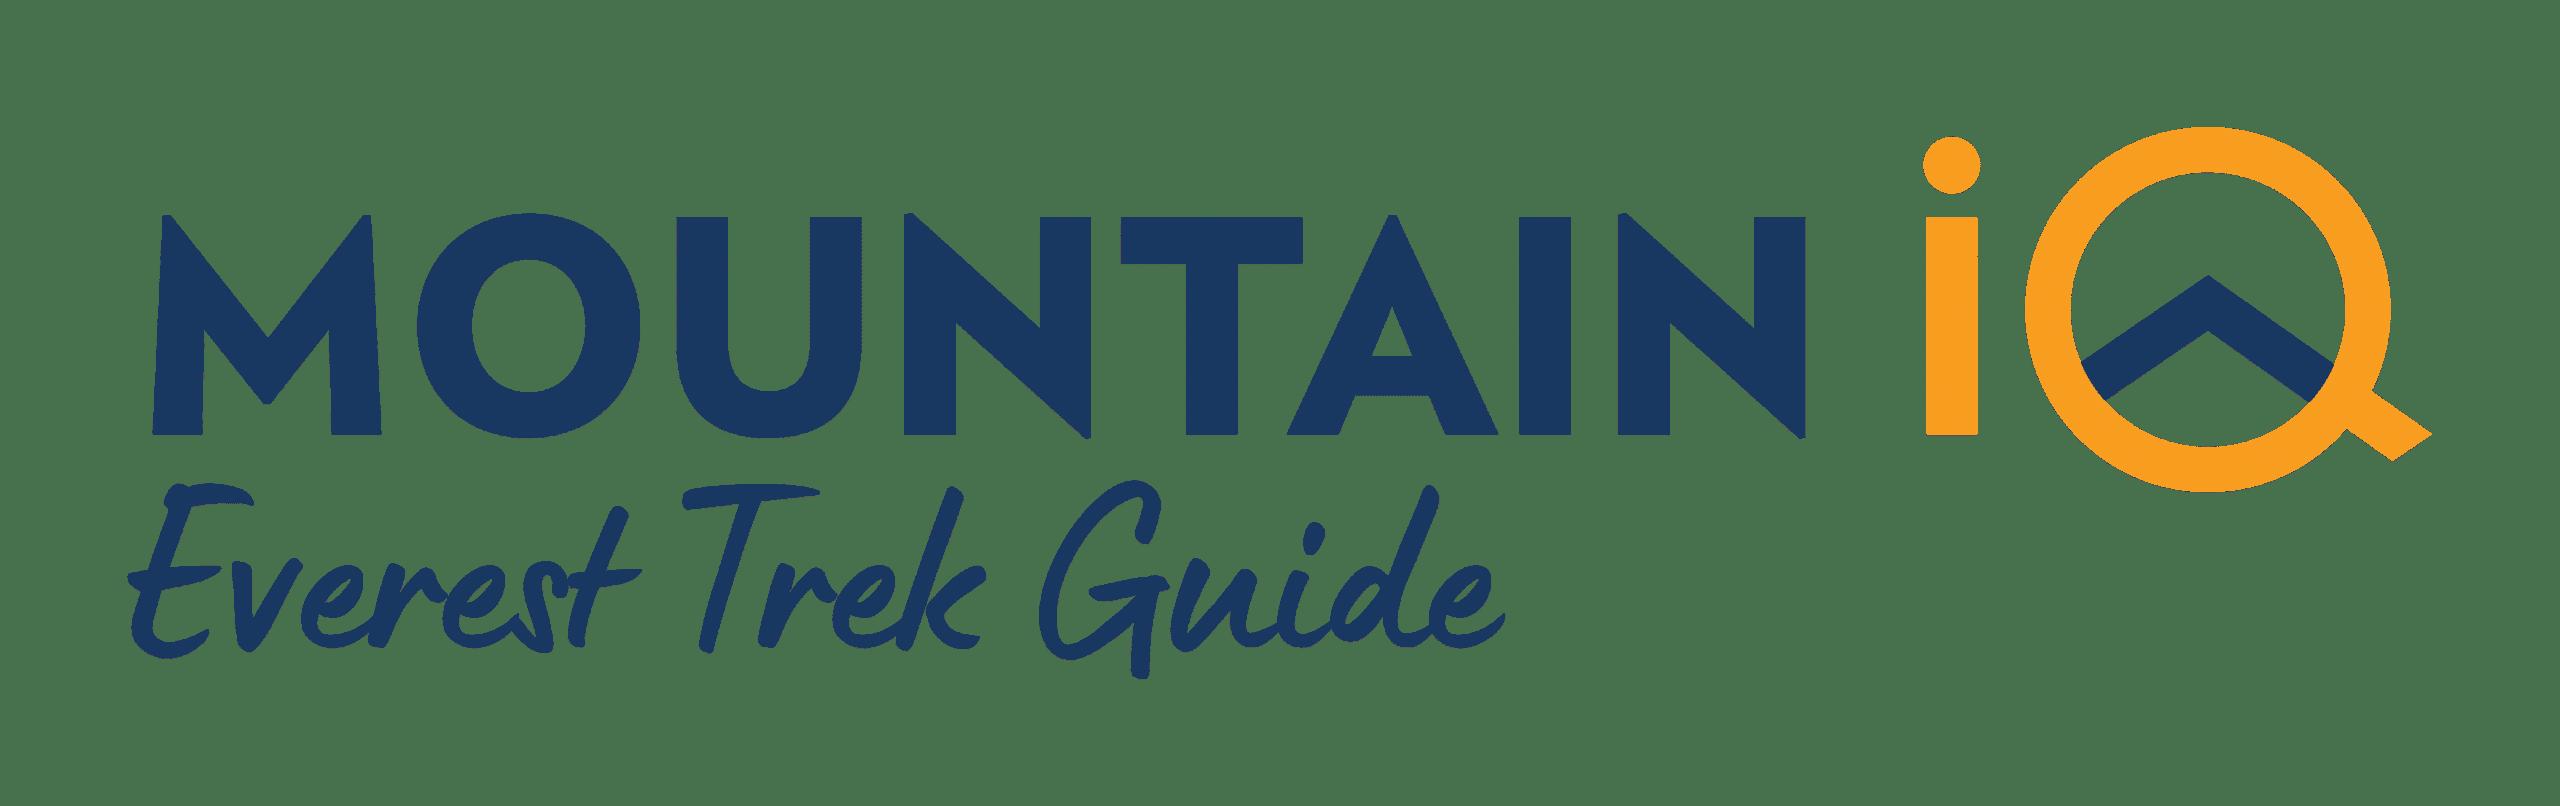 ebc trek guide mountain iq logo